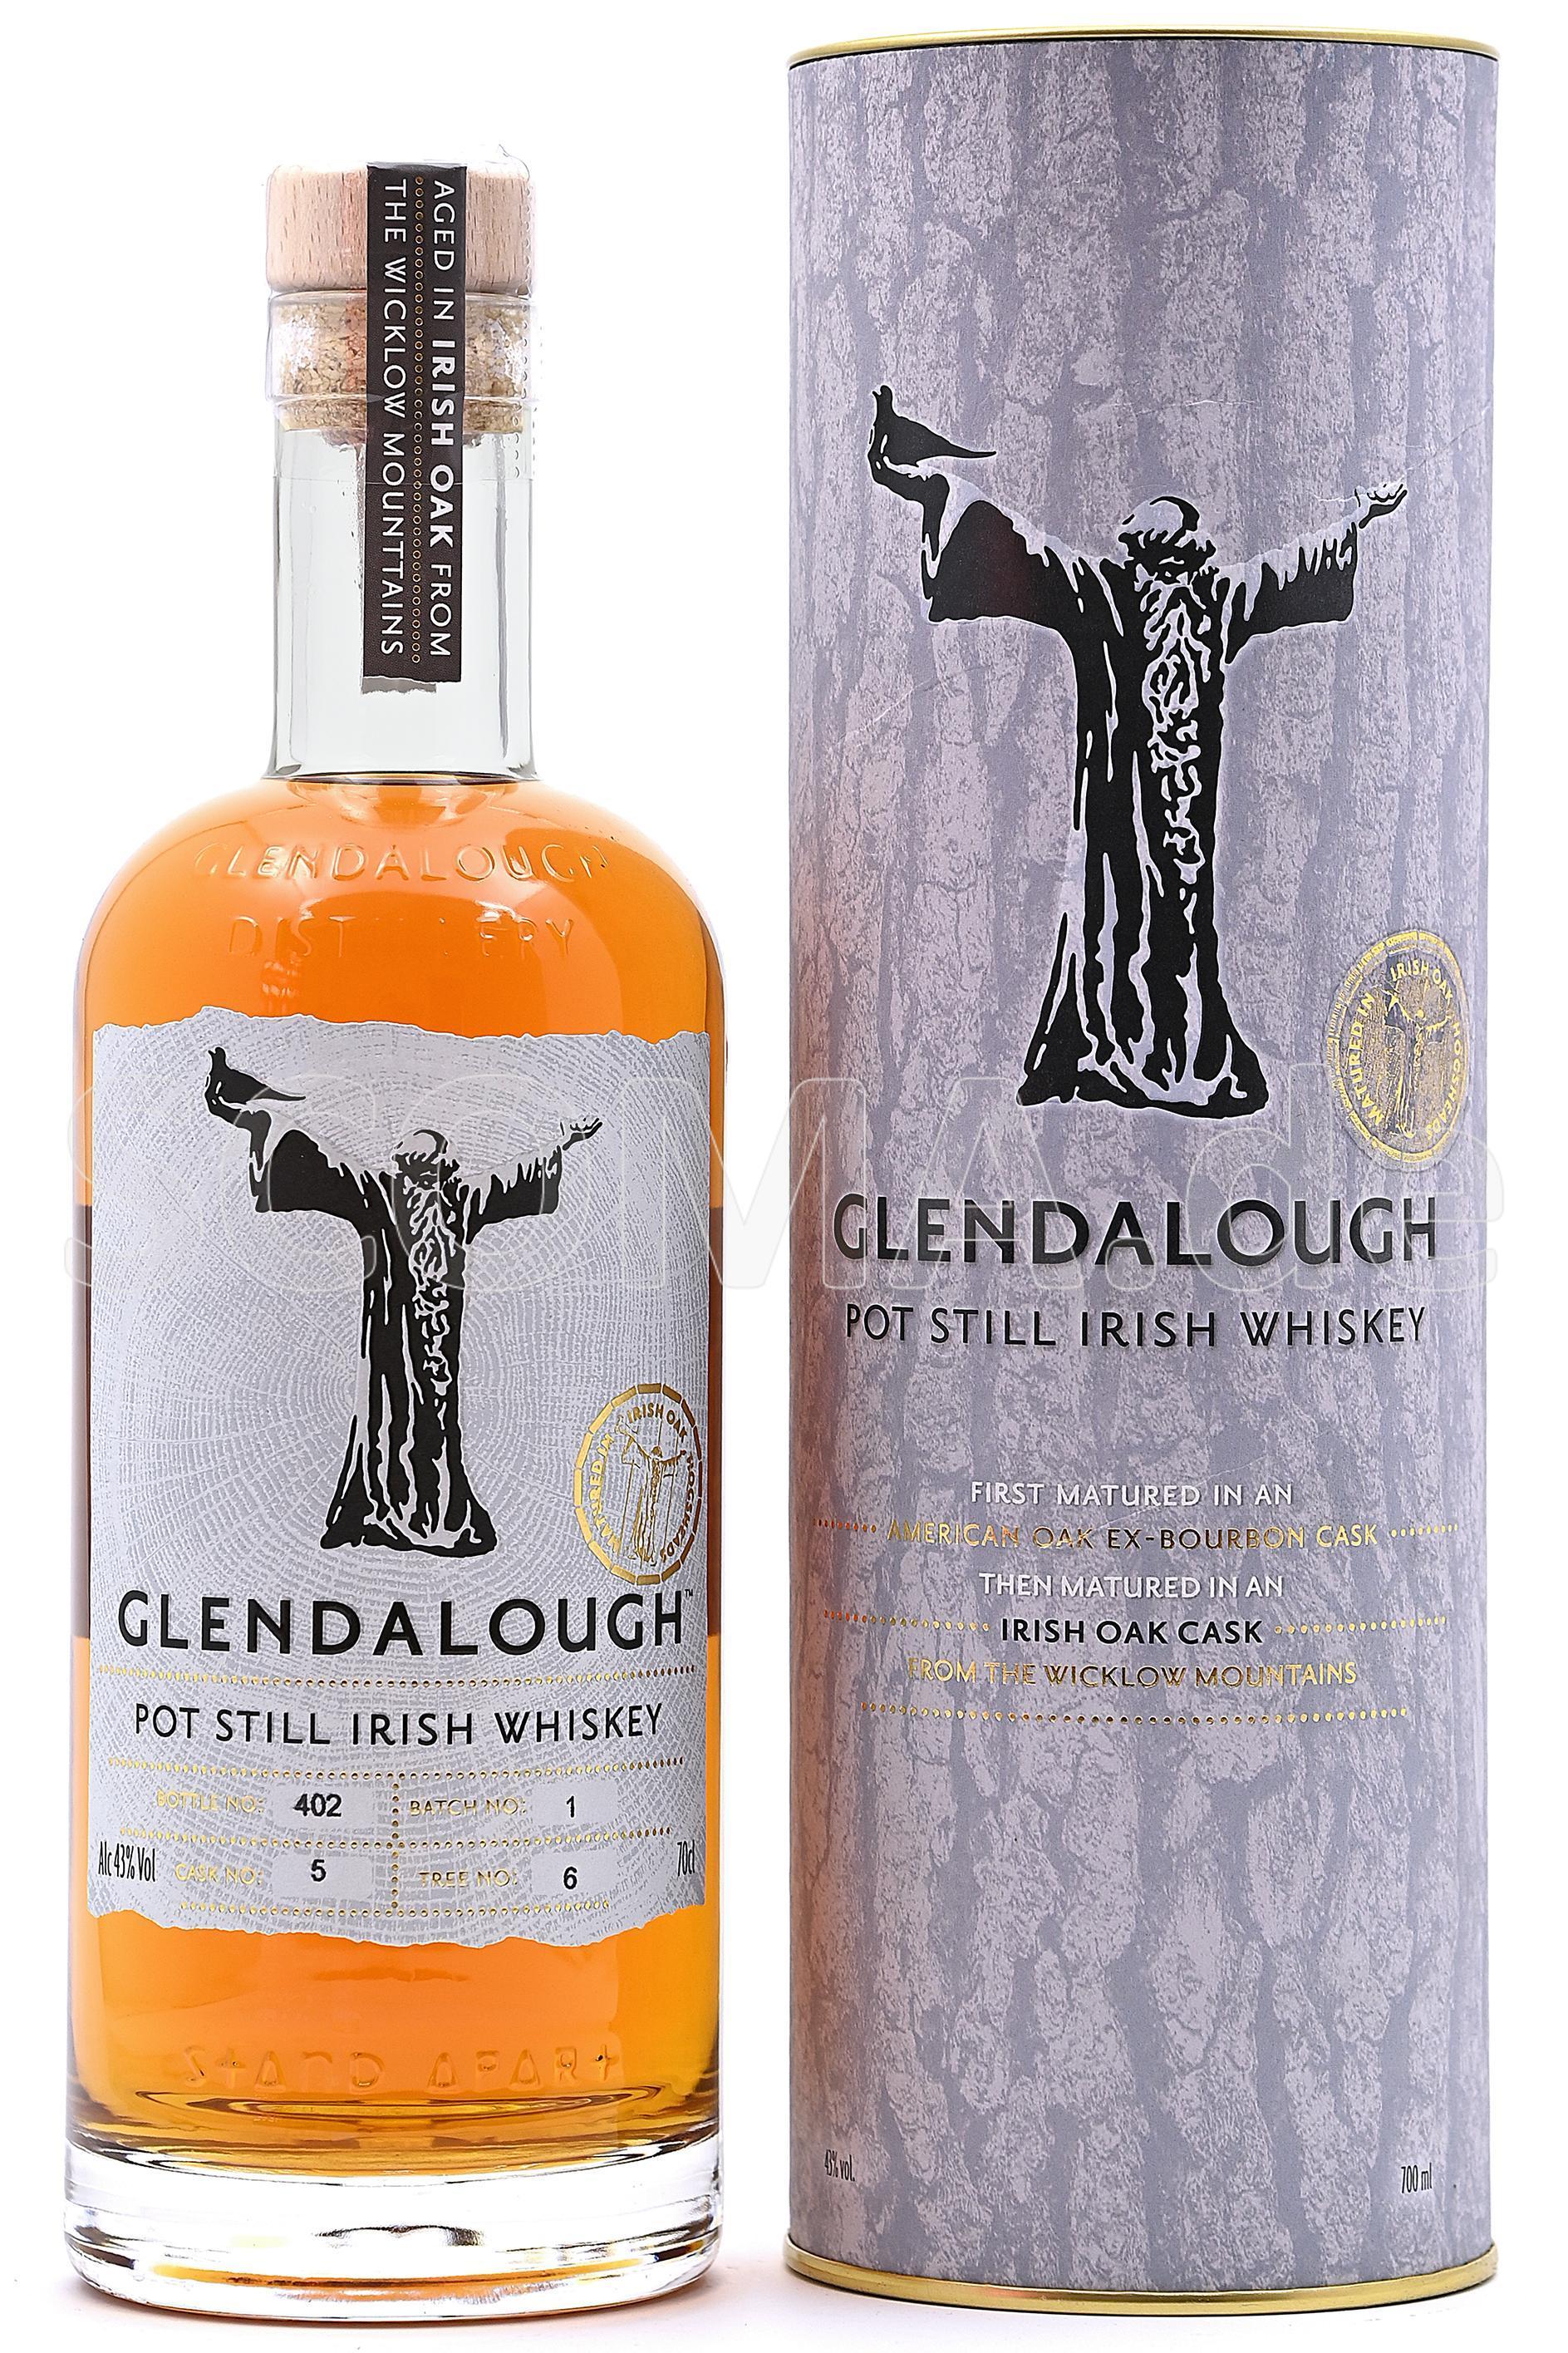 Glendalough Pot Still Irish Wh...